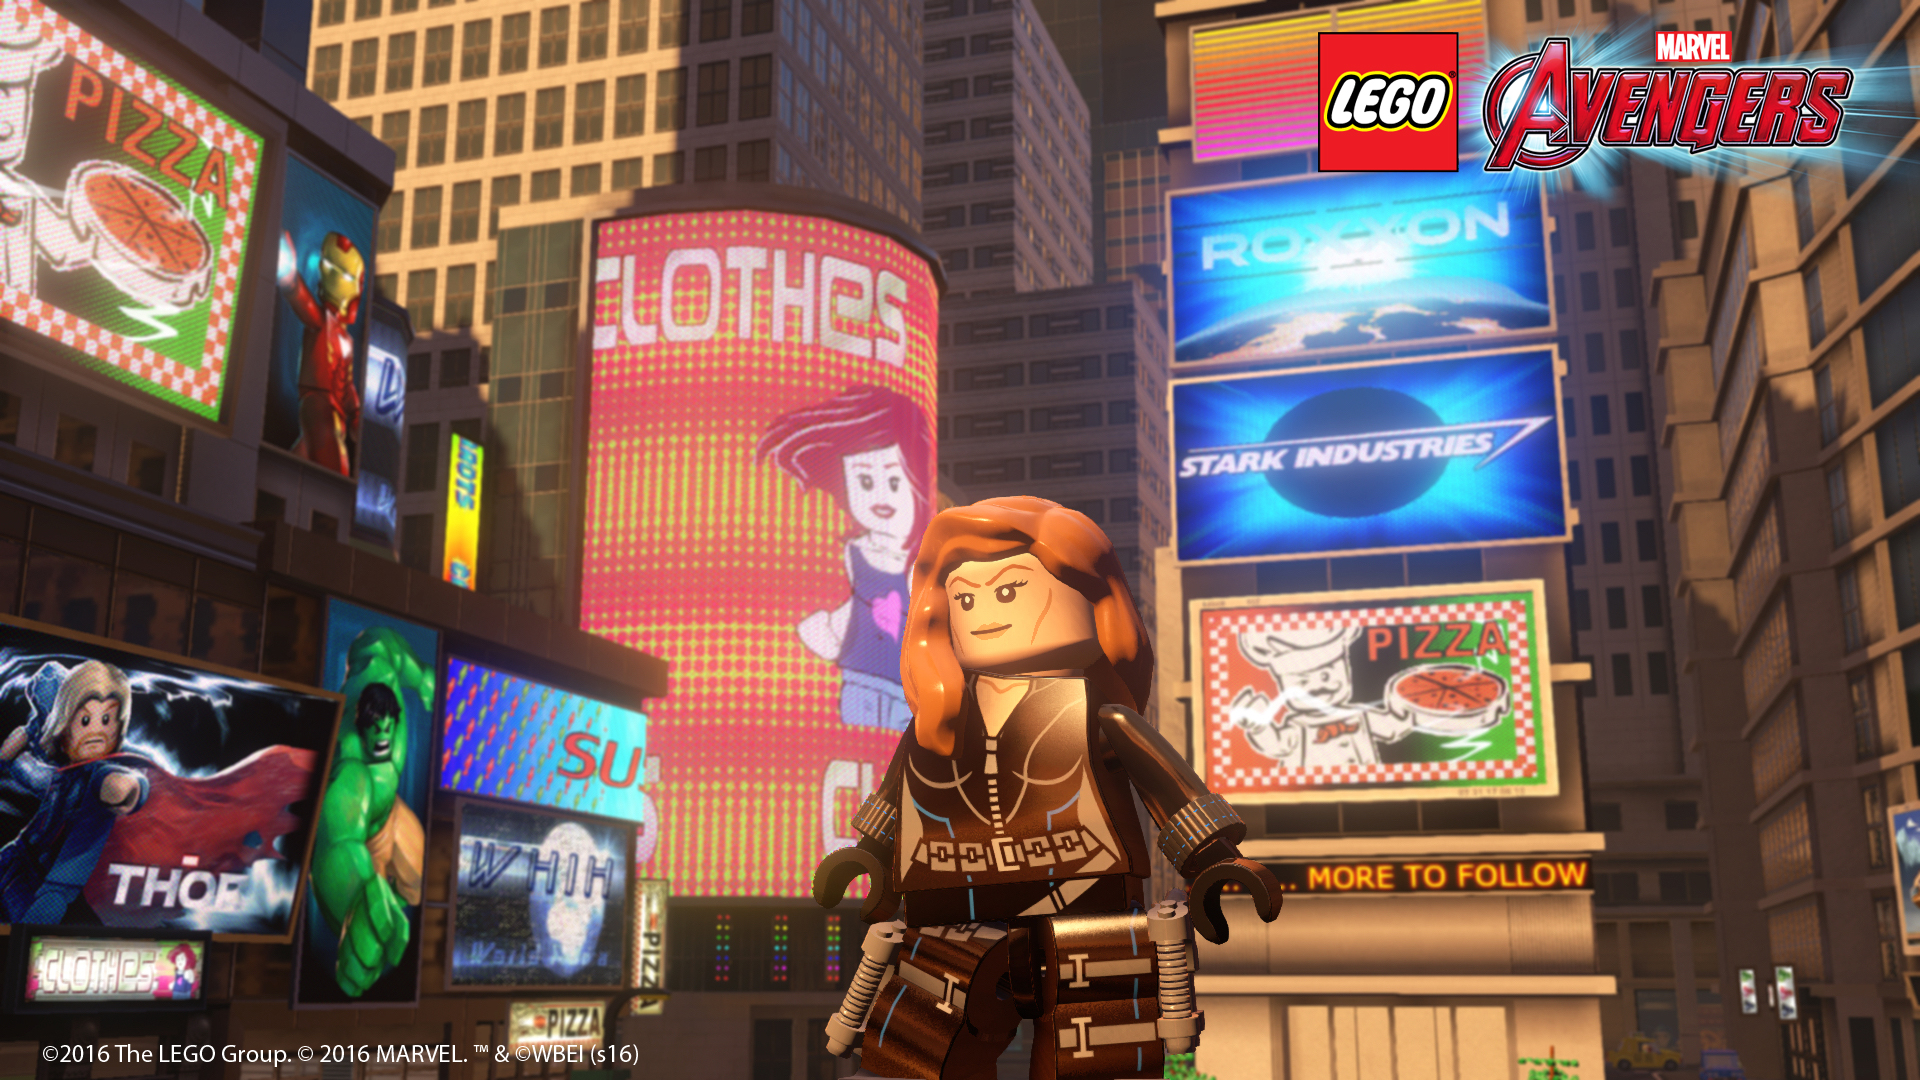 LEGO Marvels Avengers 3